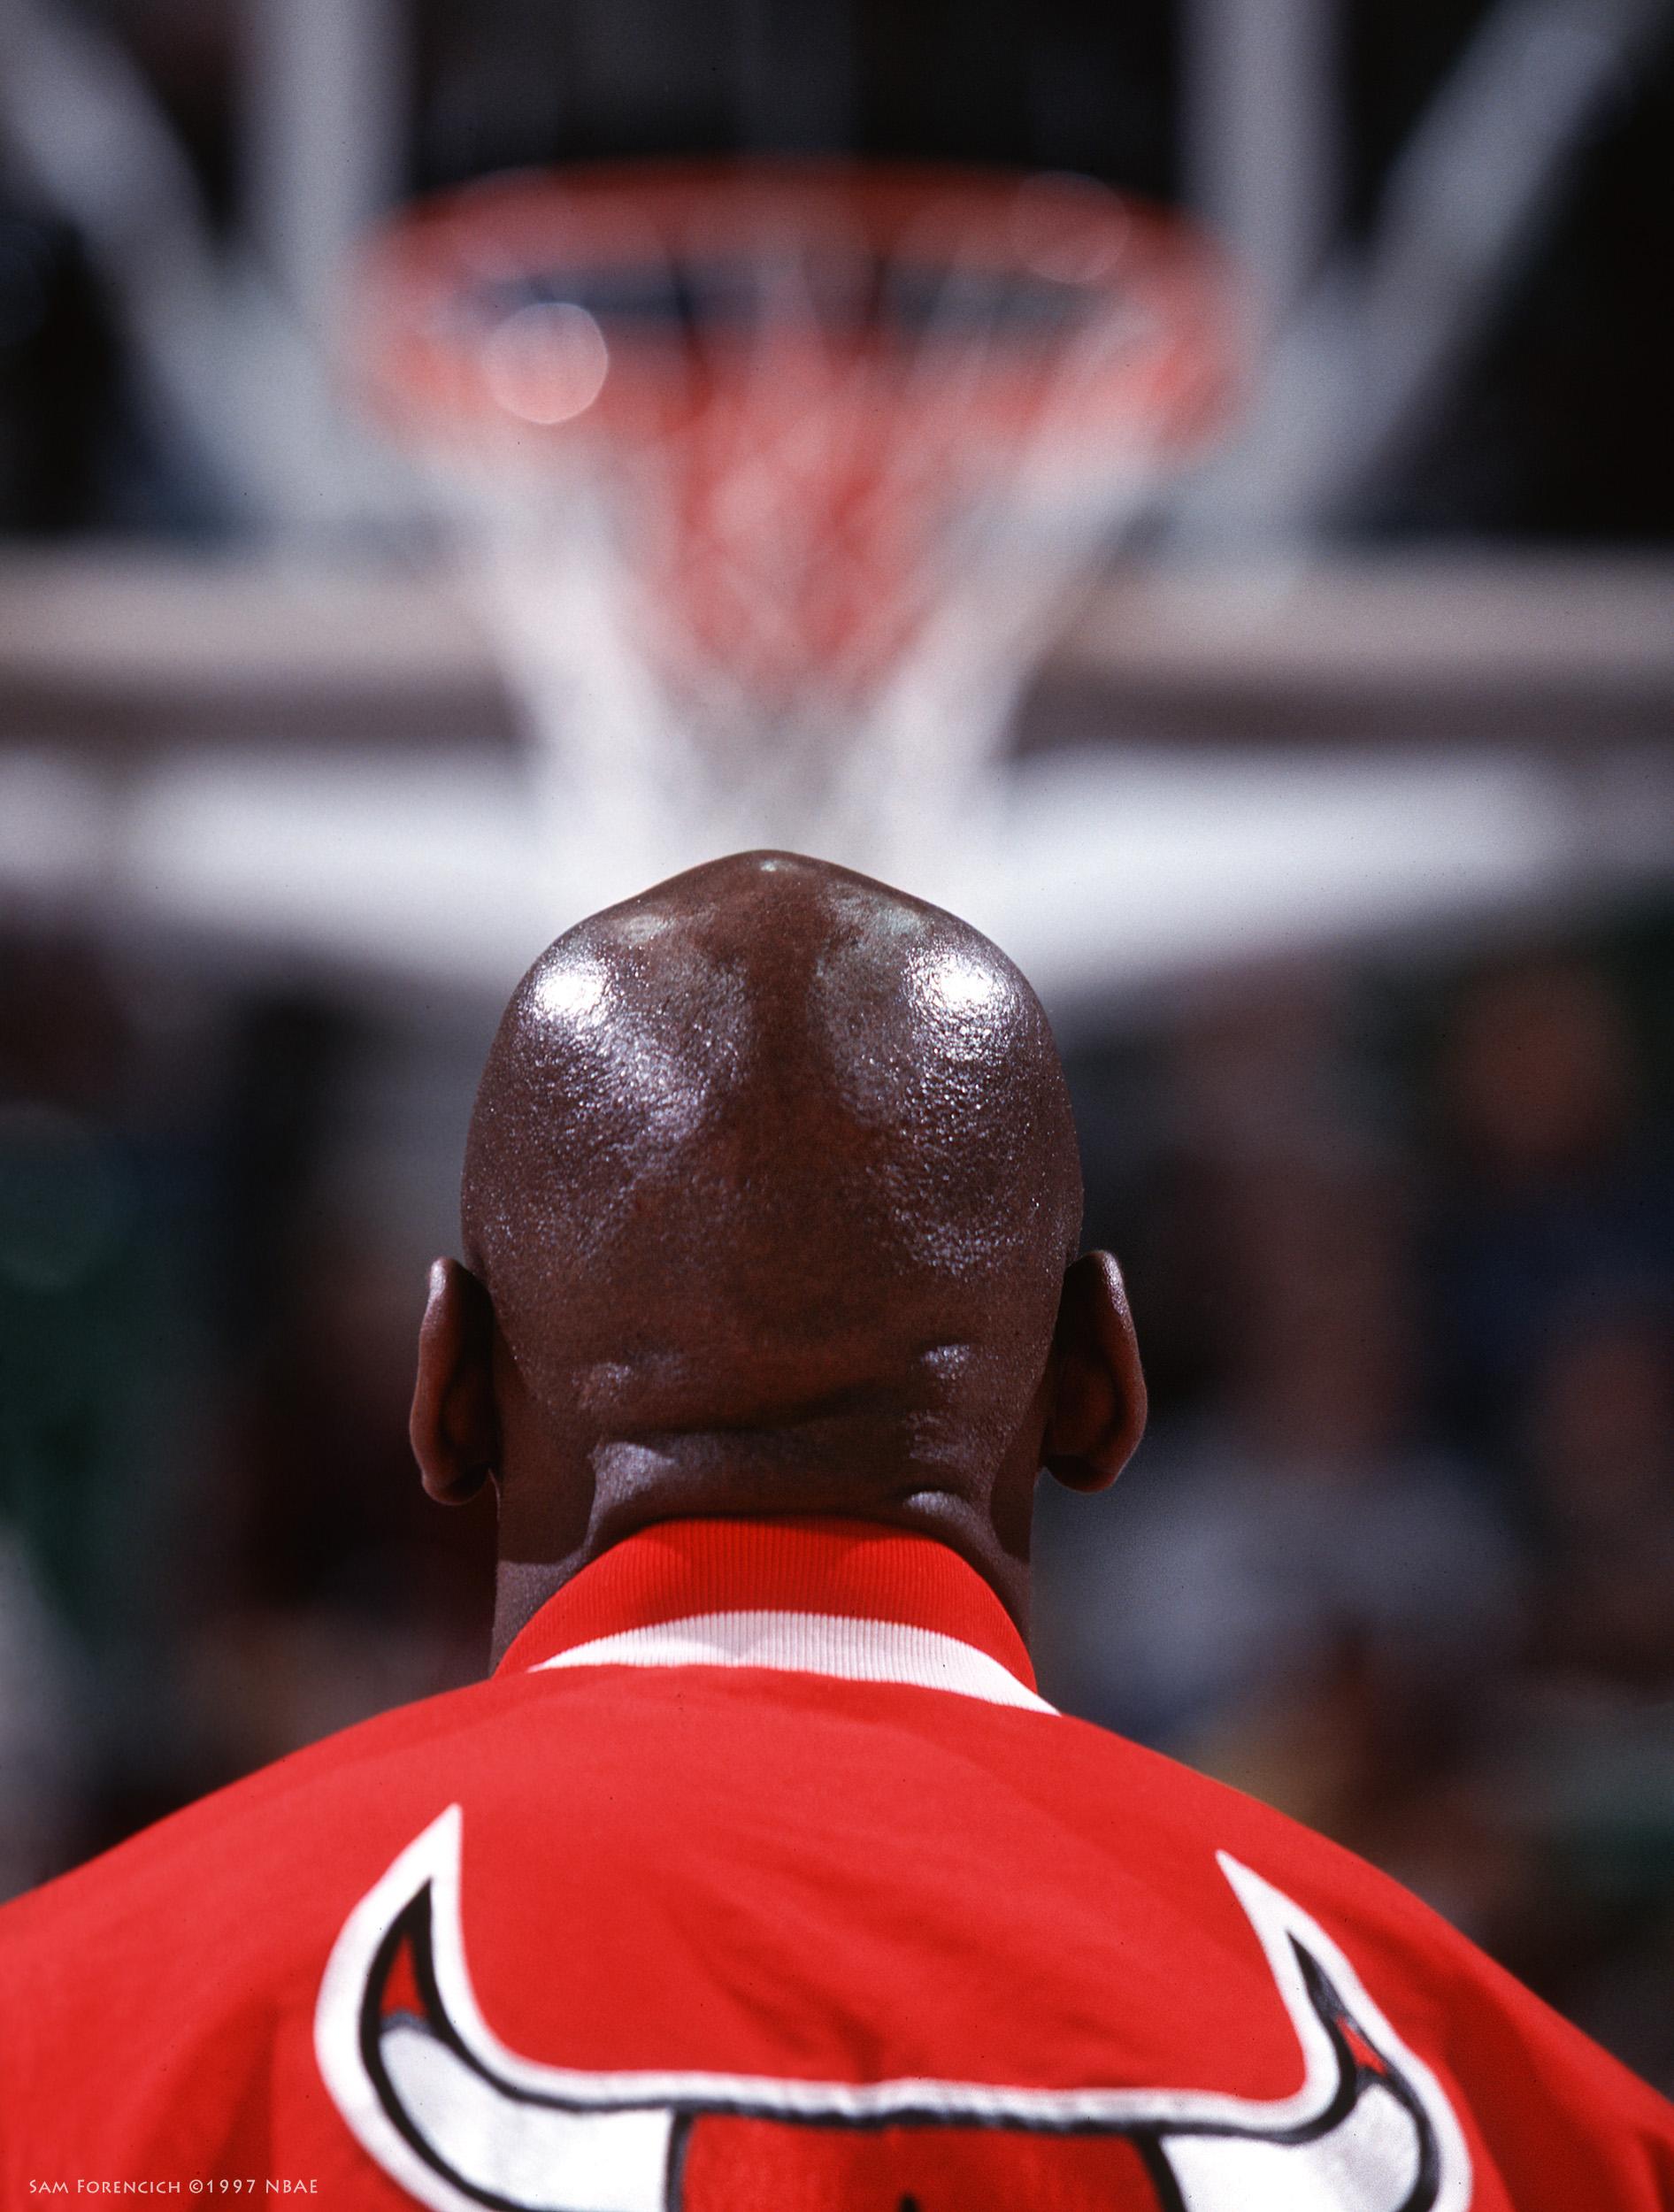 San Jose, CA - Michael Jordan of the Chicago Bulls eyes the basket during warm ups at the San Jose Arena circa 1997. 35 mm RDP 100 film, arena strobe lighting. Sam Forencich ©1997 NBAE